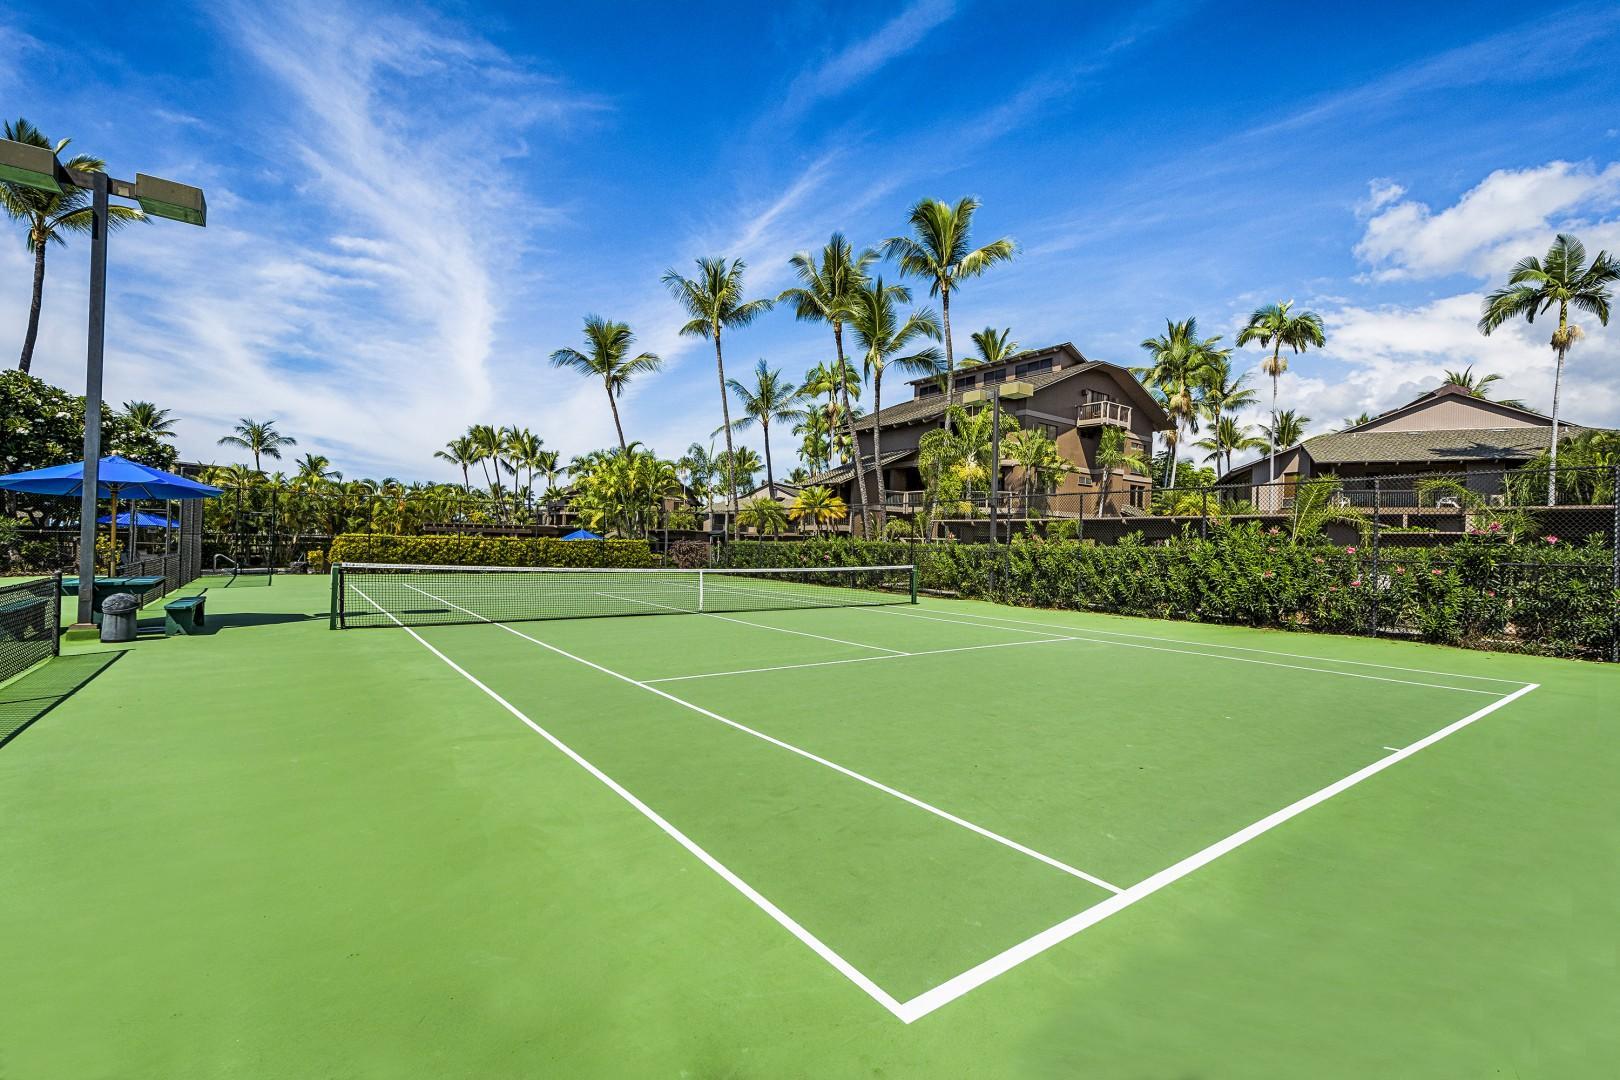 Tennis court at Kanaloa at Kona